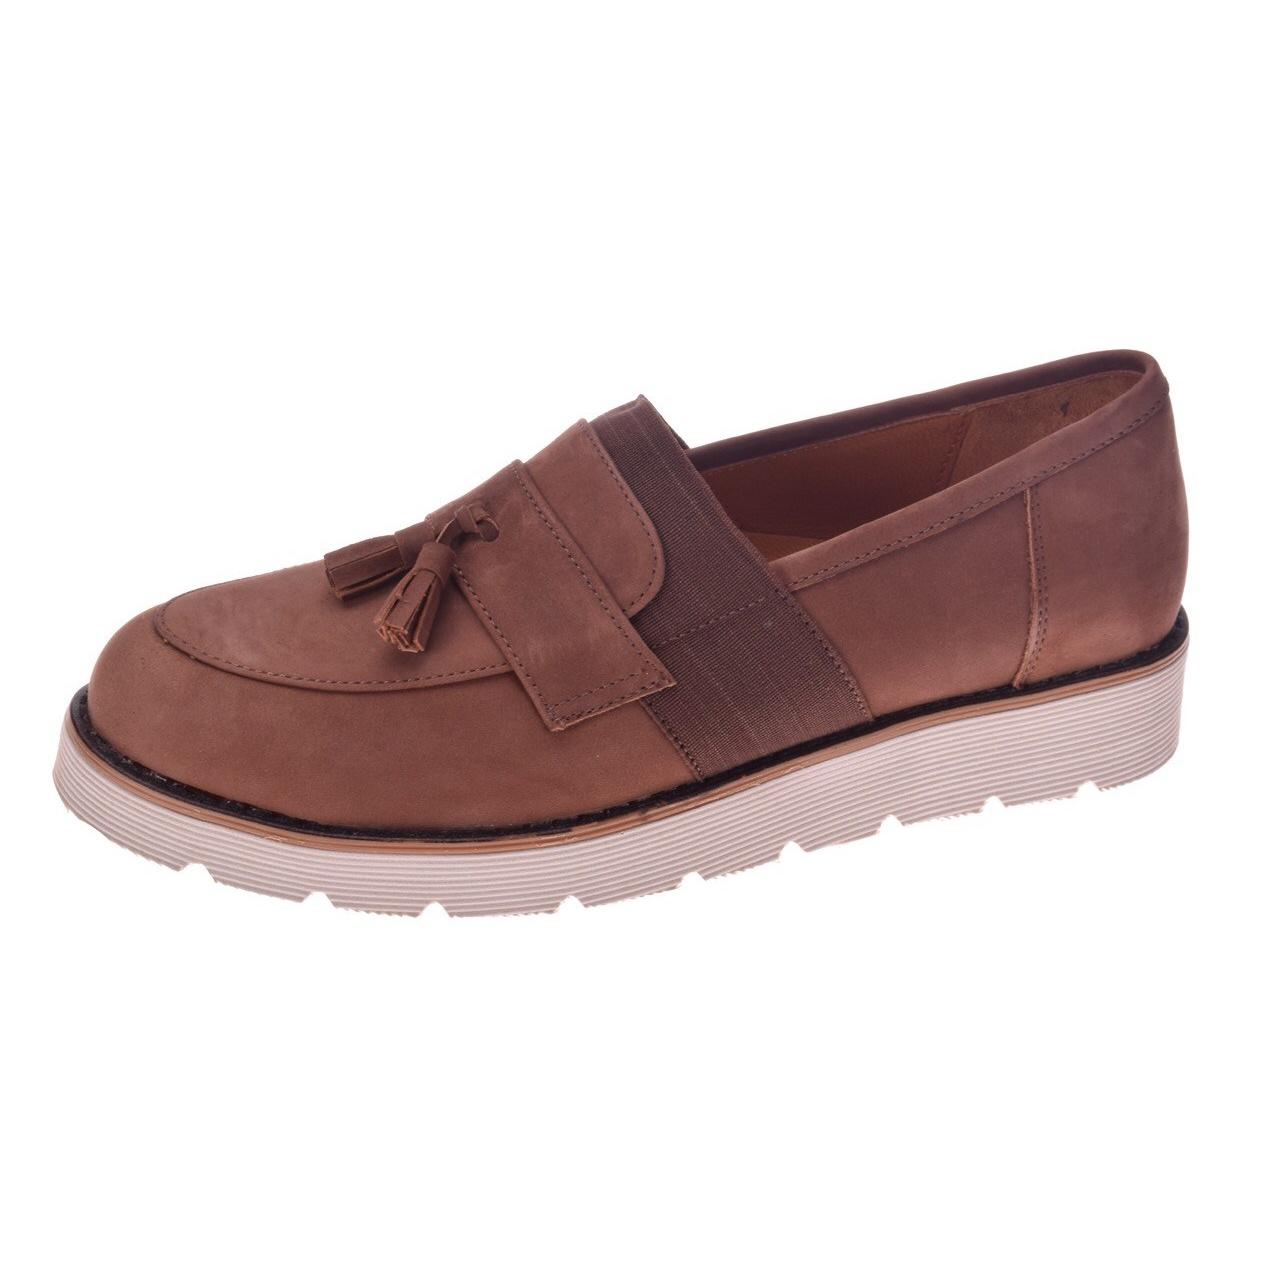 کفش چرم زنانه پانیسا مدل 705C